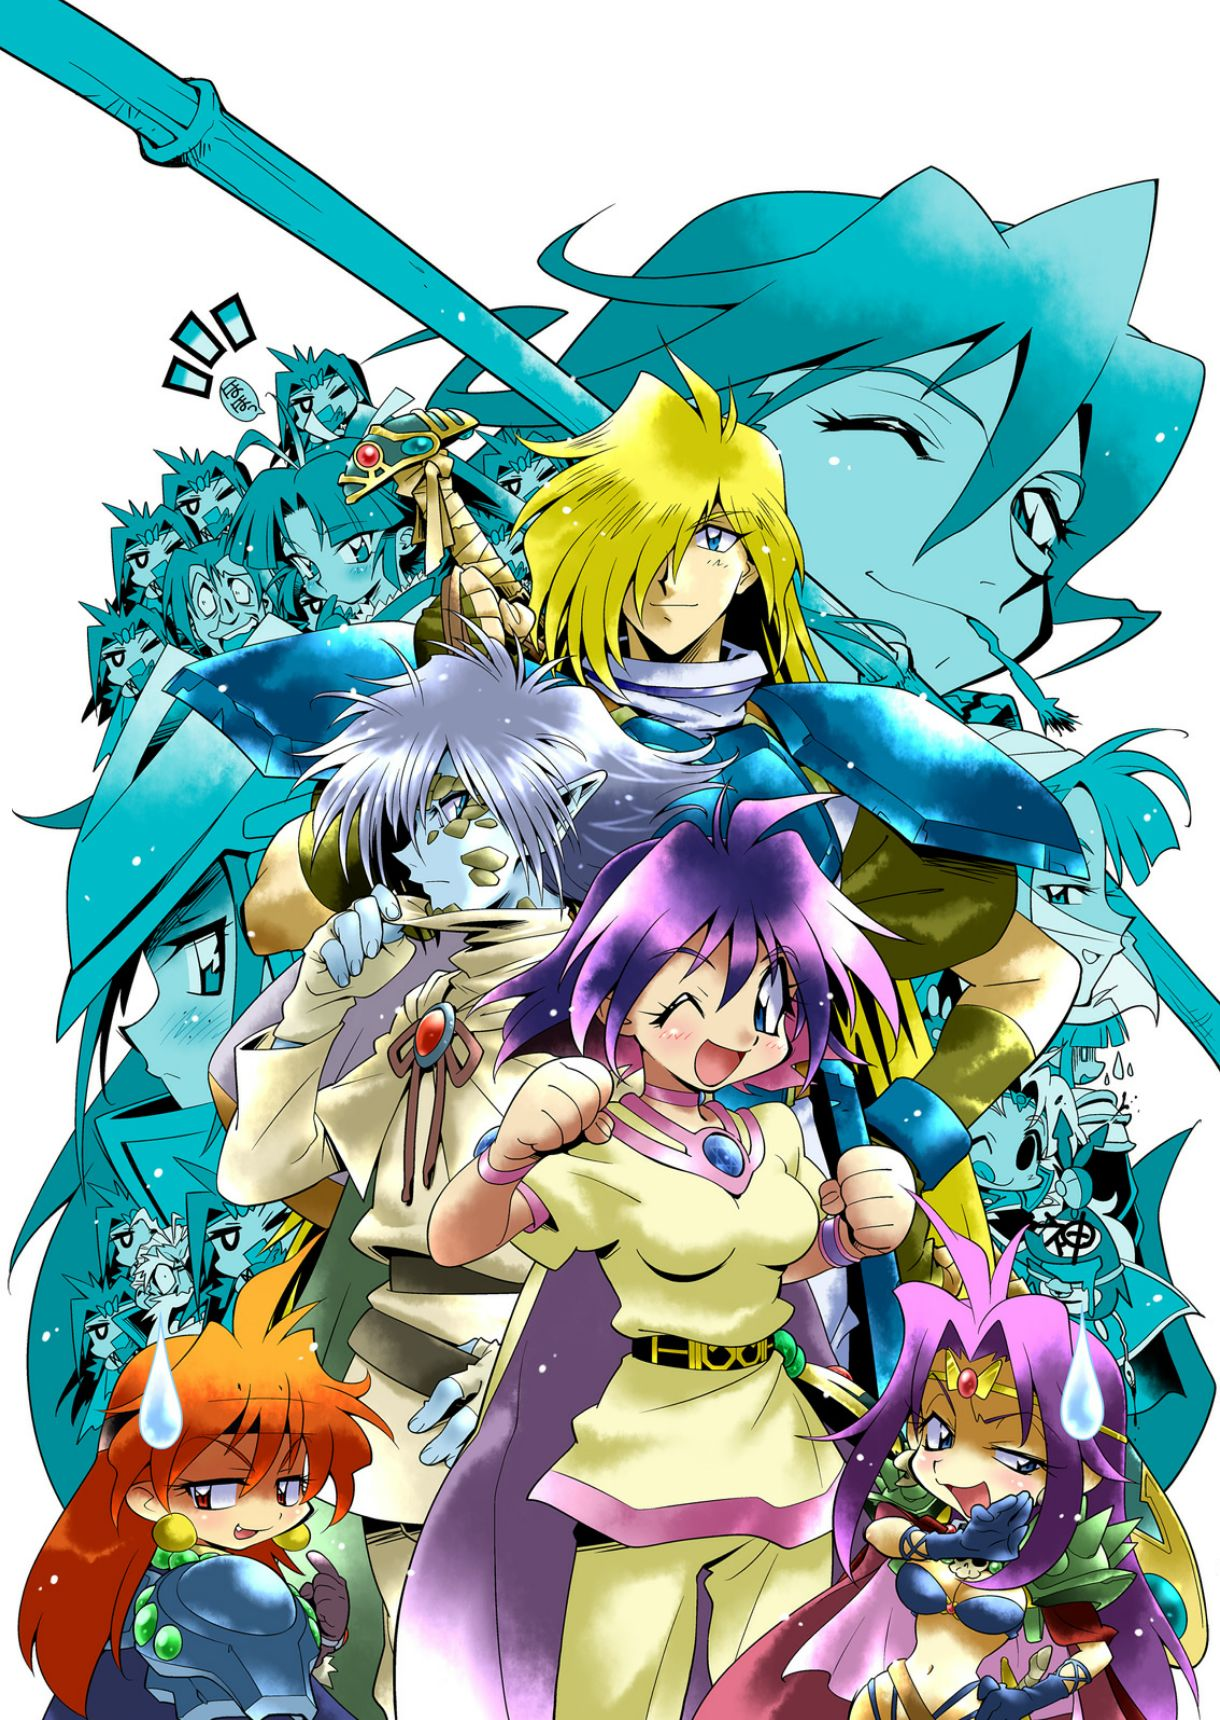 Slayers (With images) Slayer anime, Anime characters